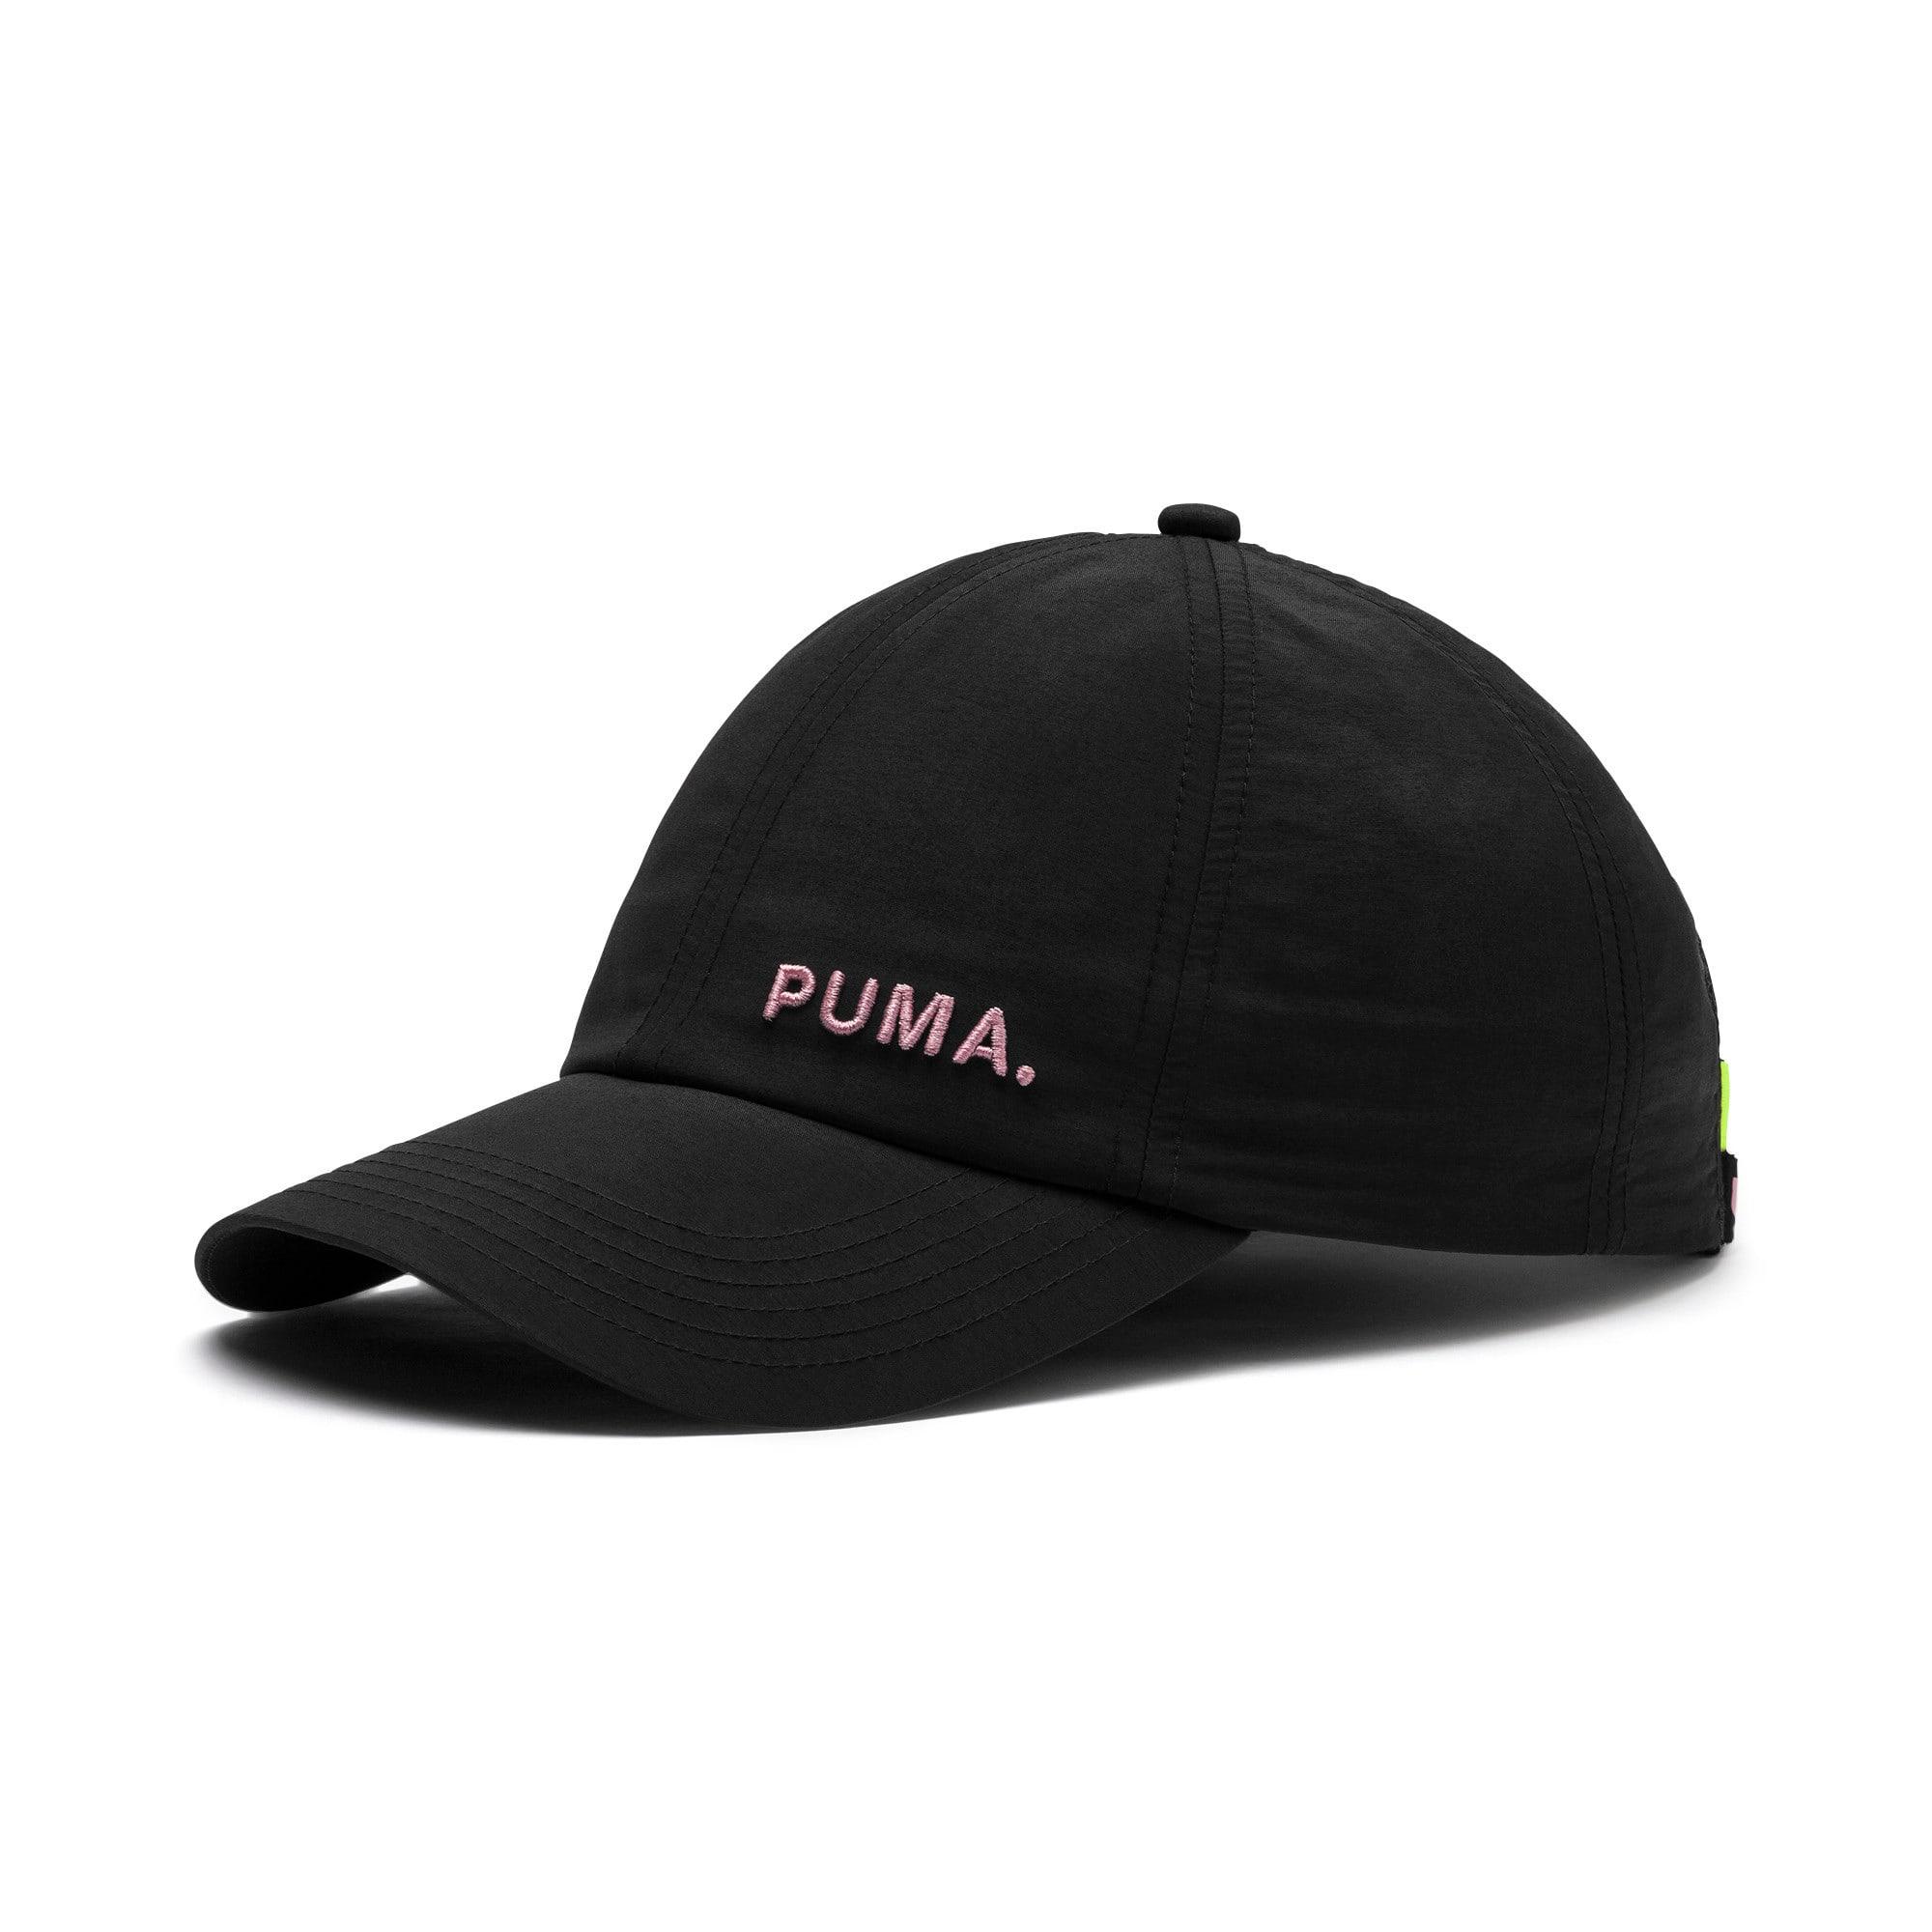 Thumbnail 1 of Women's Shift Cap, Puma Black-Bridal Rose, medium